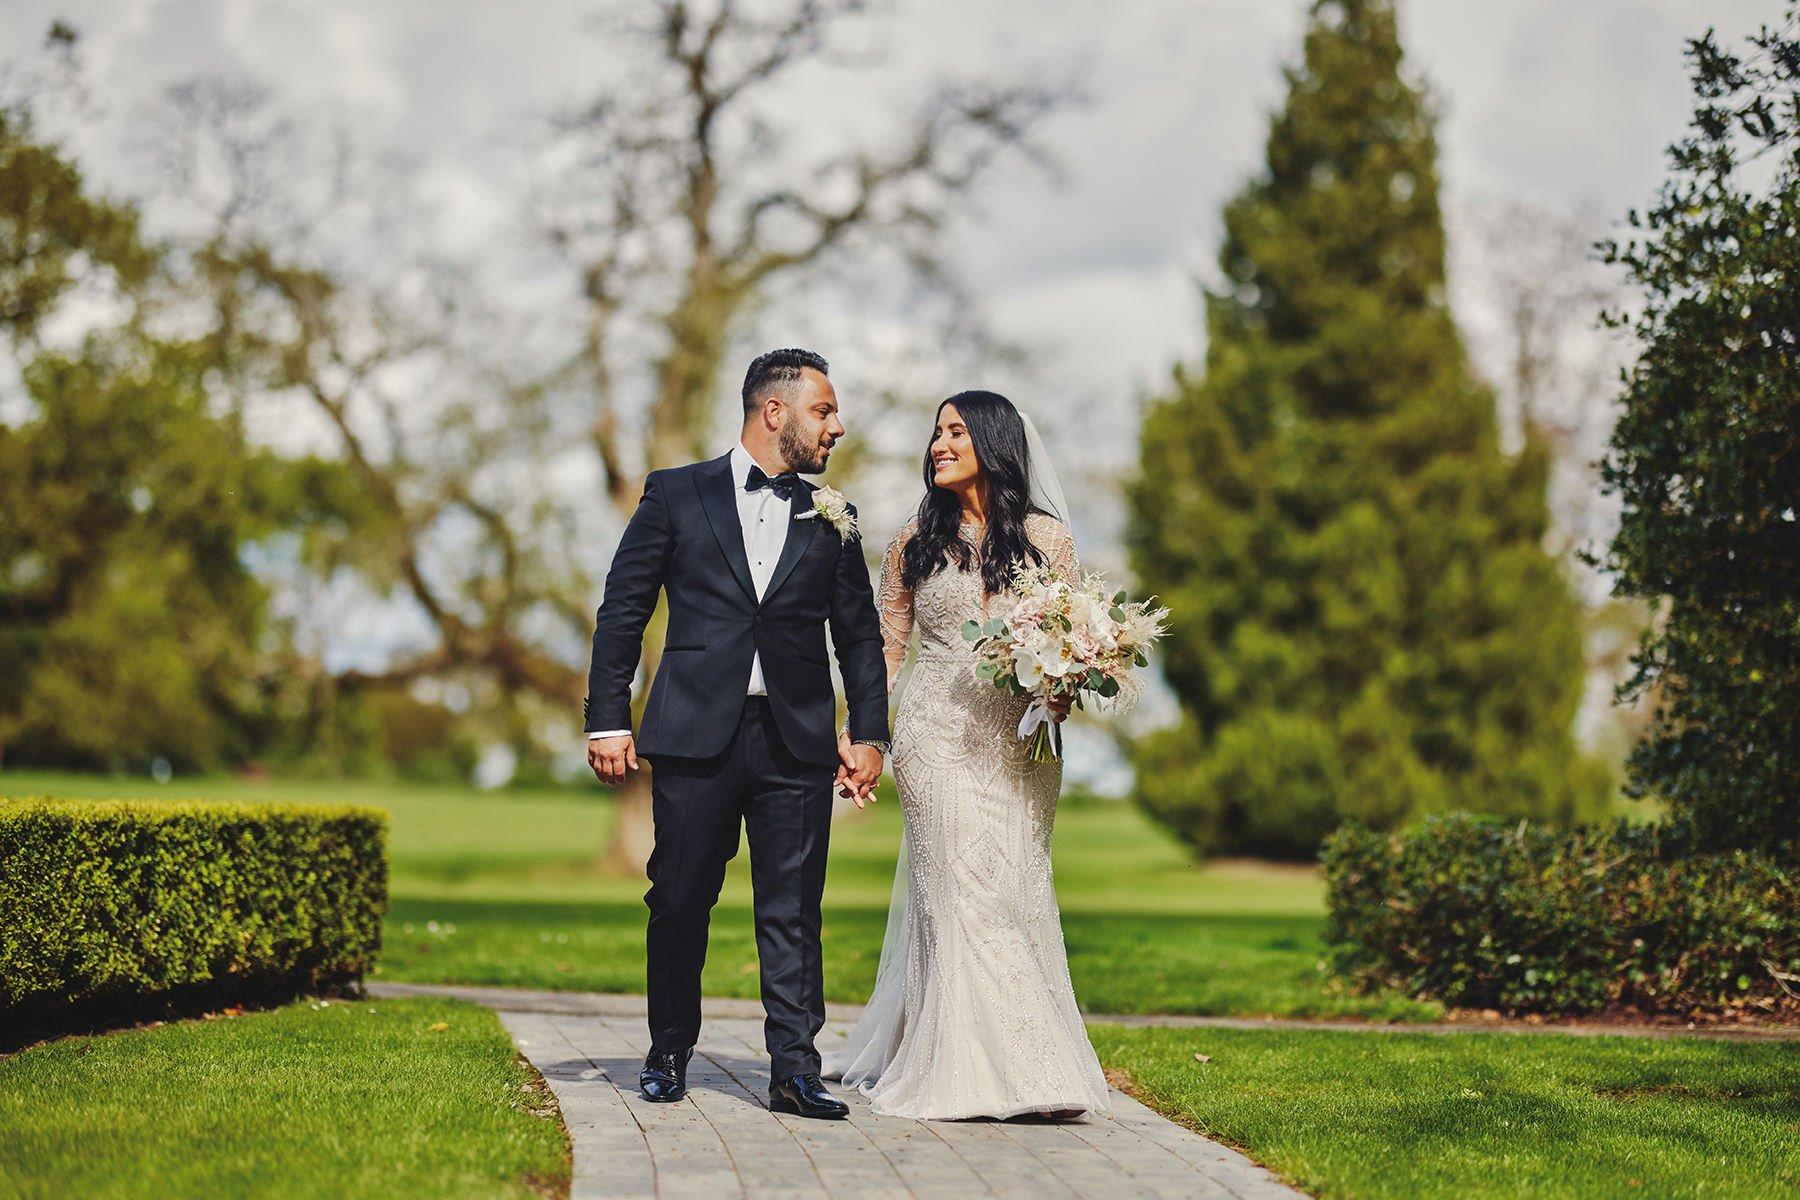 Wedding at Ballykealey House Barn 6